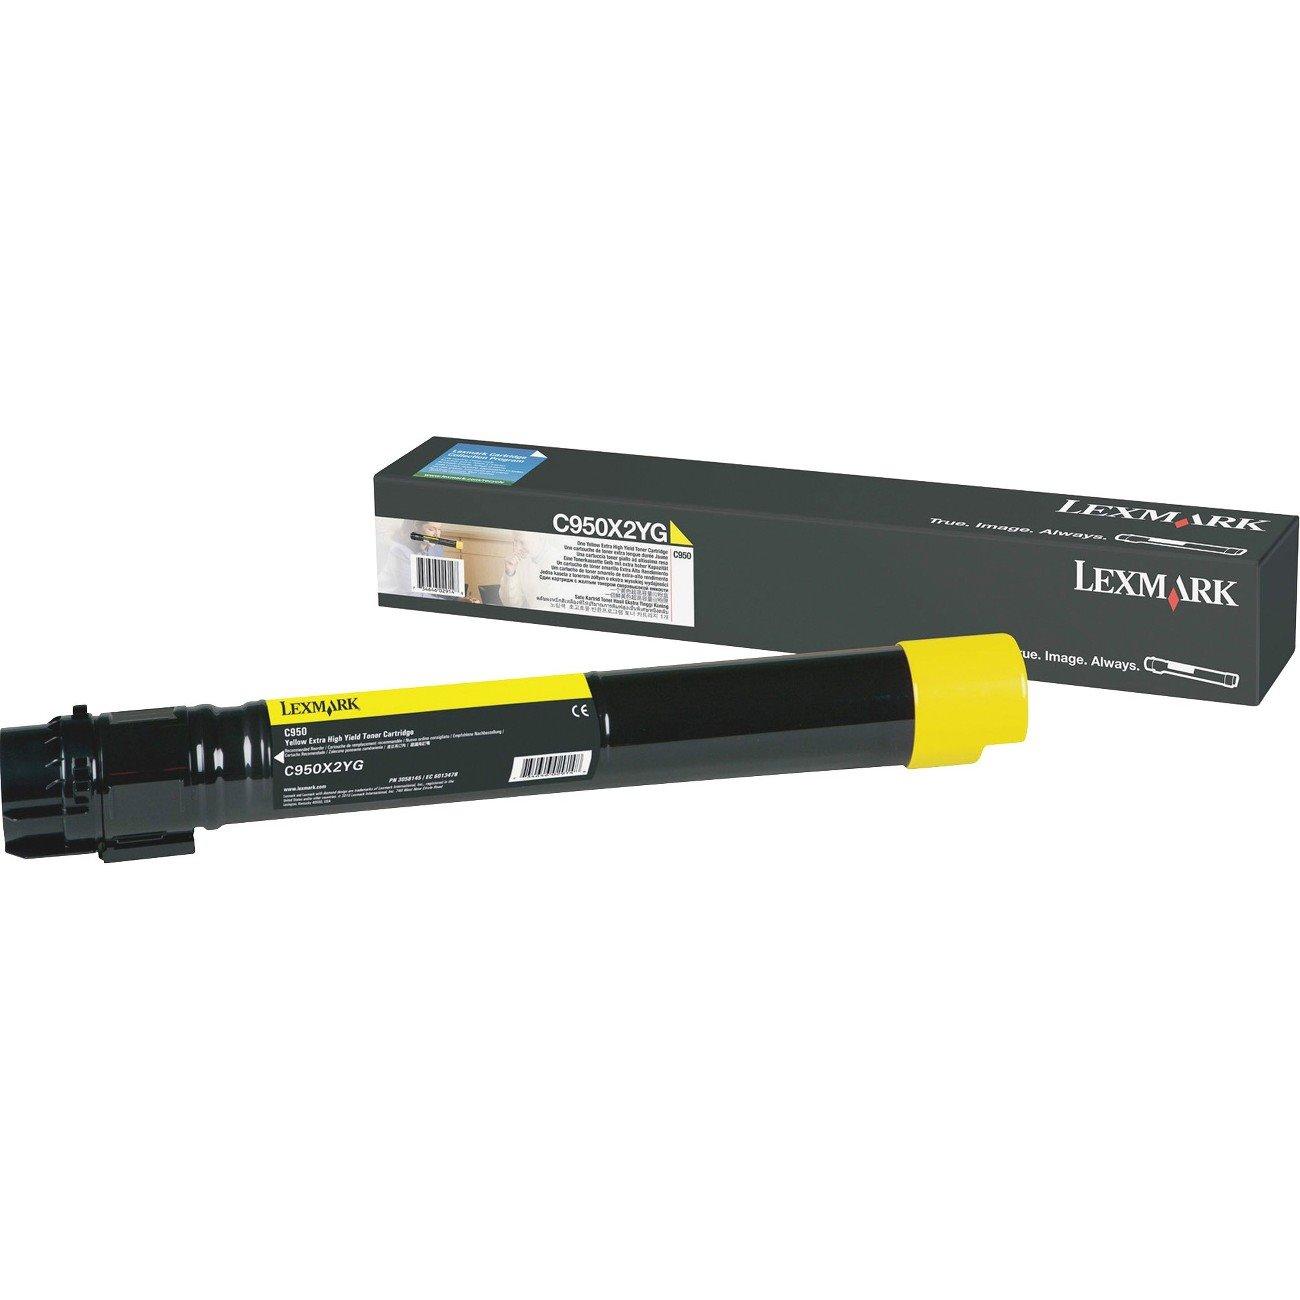 Lexmark C950X2YG Original Toner Cartridge - Yellow